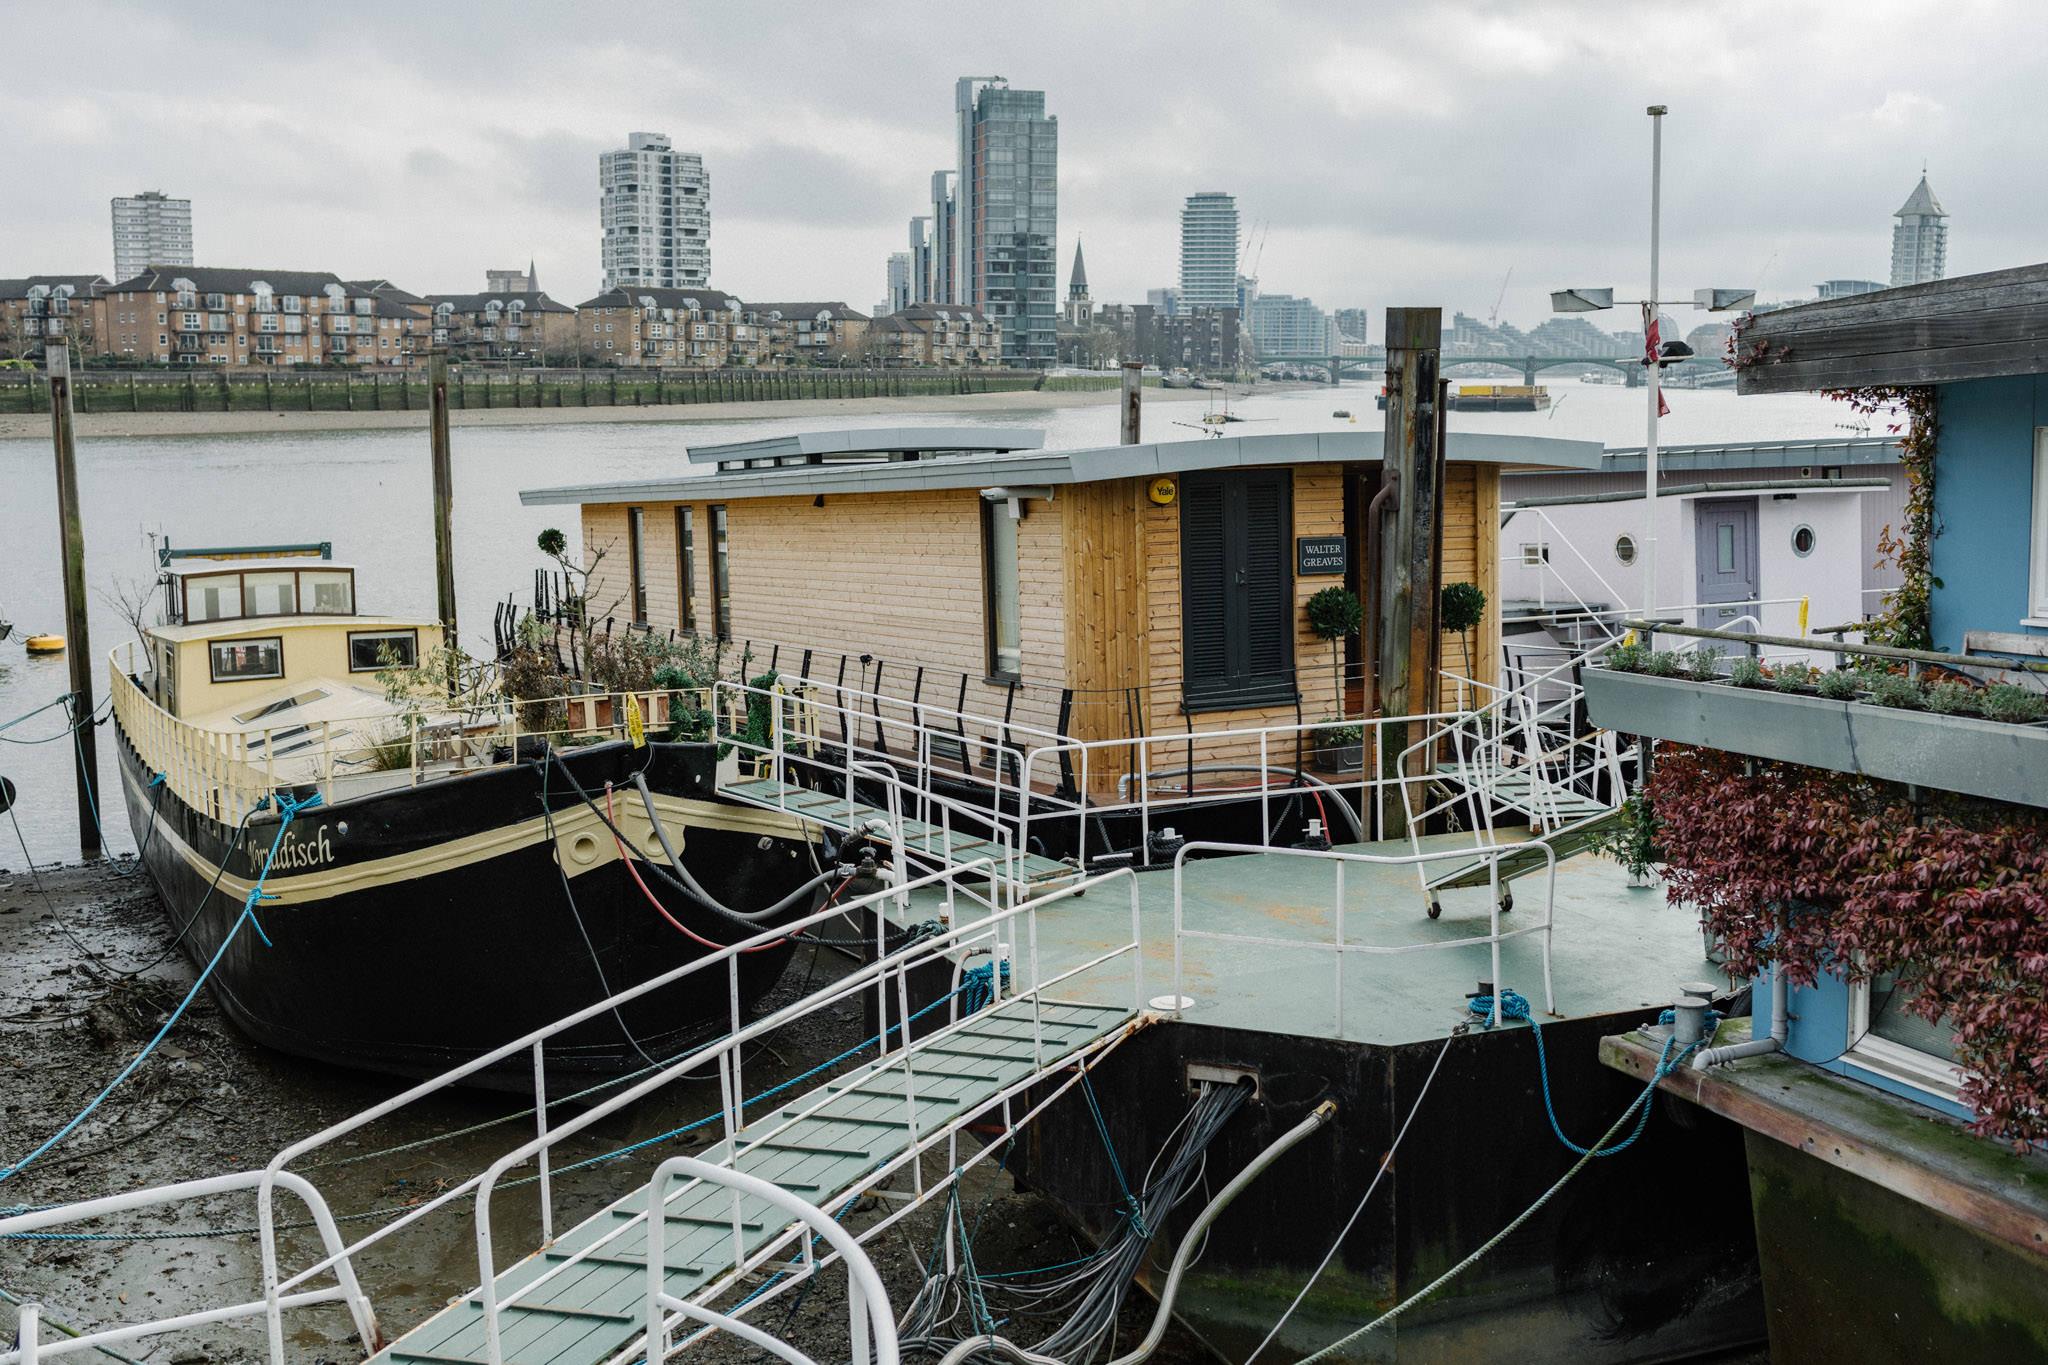 Barki na Tamizie